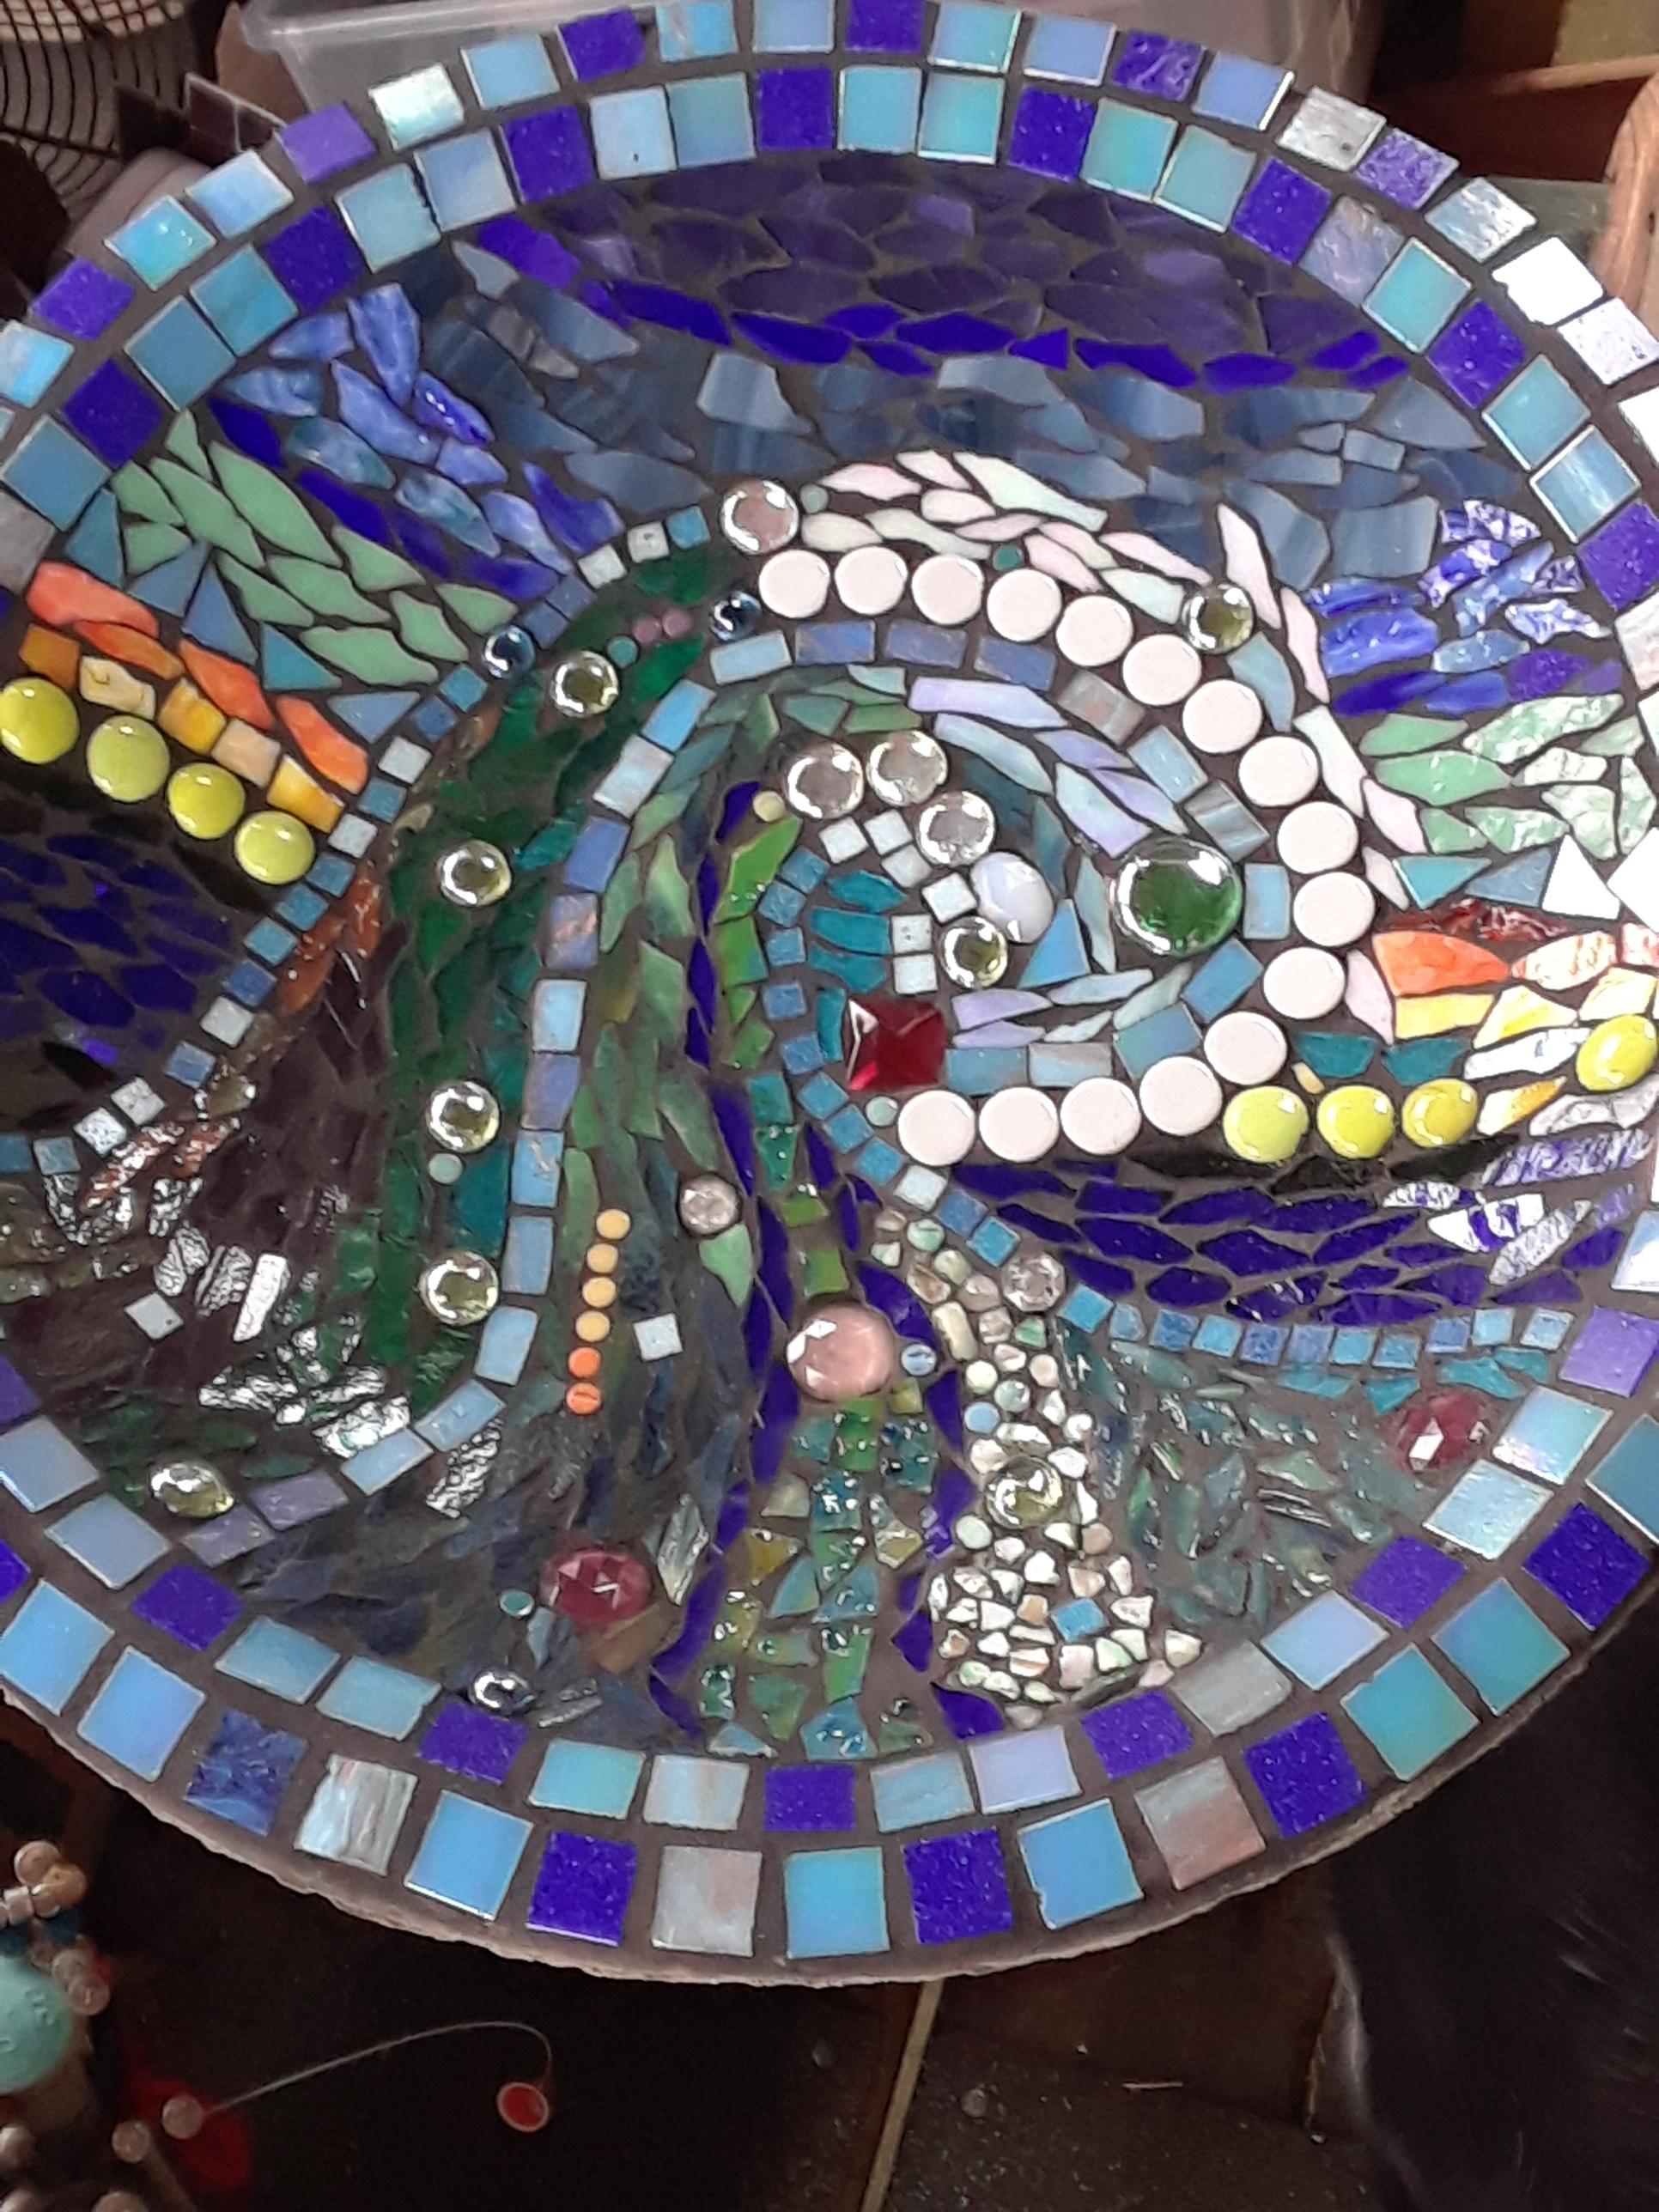 Cheryl Hazen - Salvaged Treasures by Cheryl, Glass